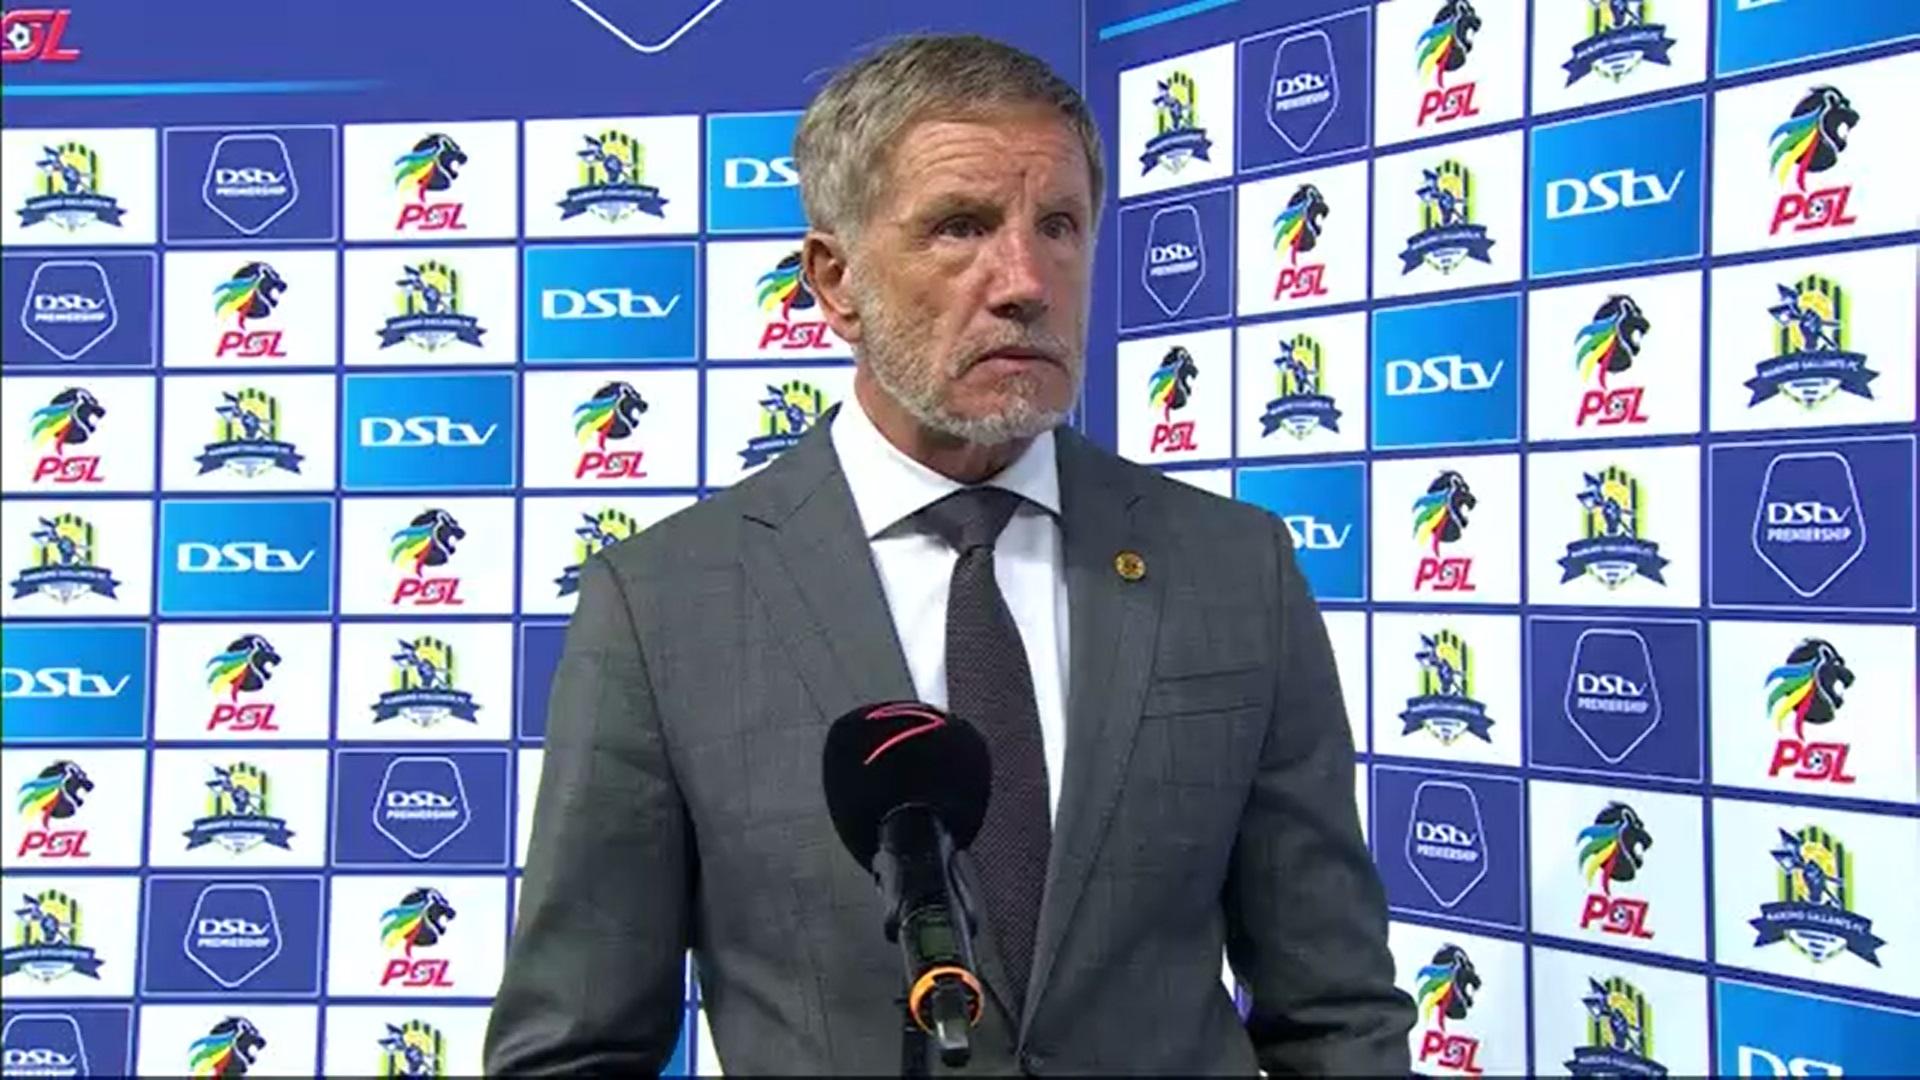 DStv Premiership | Marumo Gallants v Kaizer Chiefs | Post-match interview with Stuart Baxter